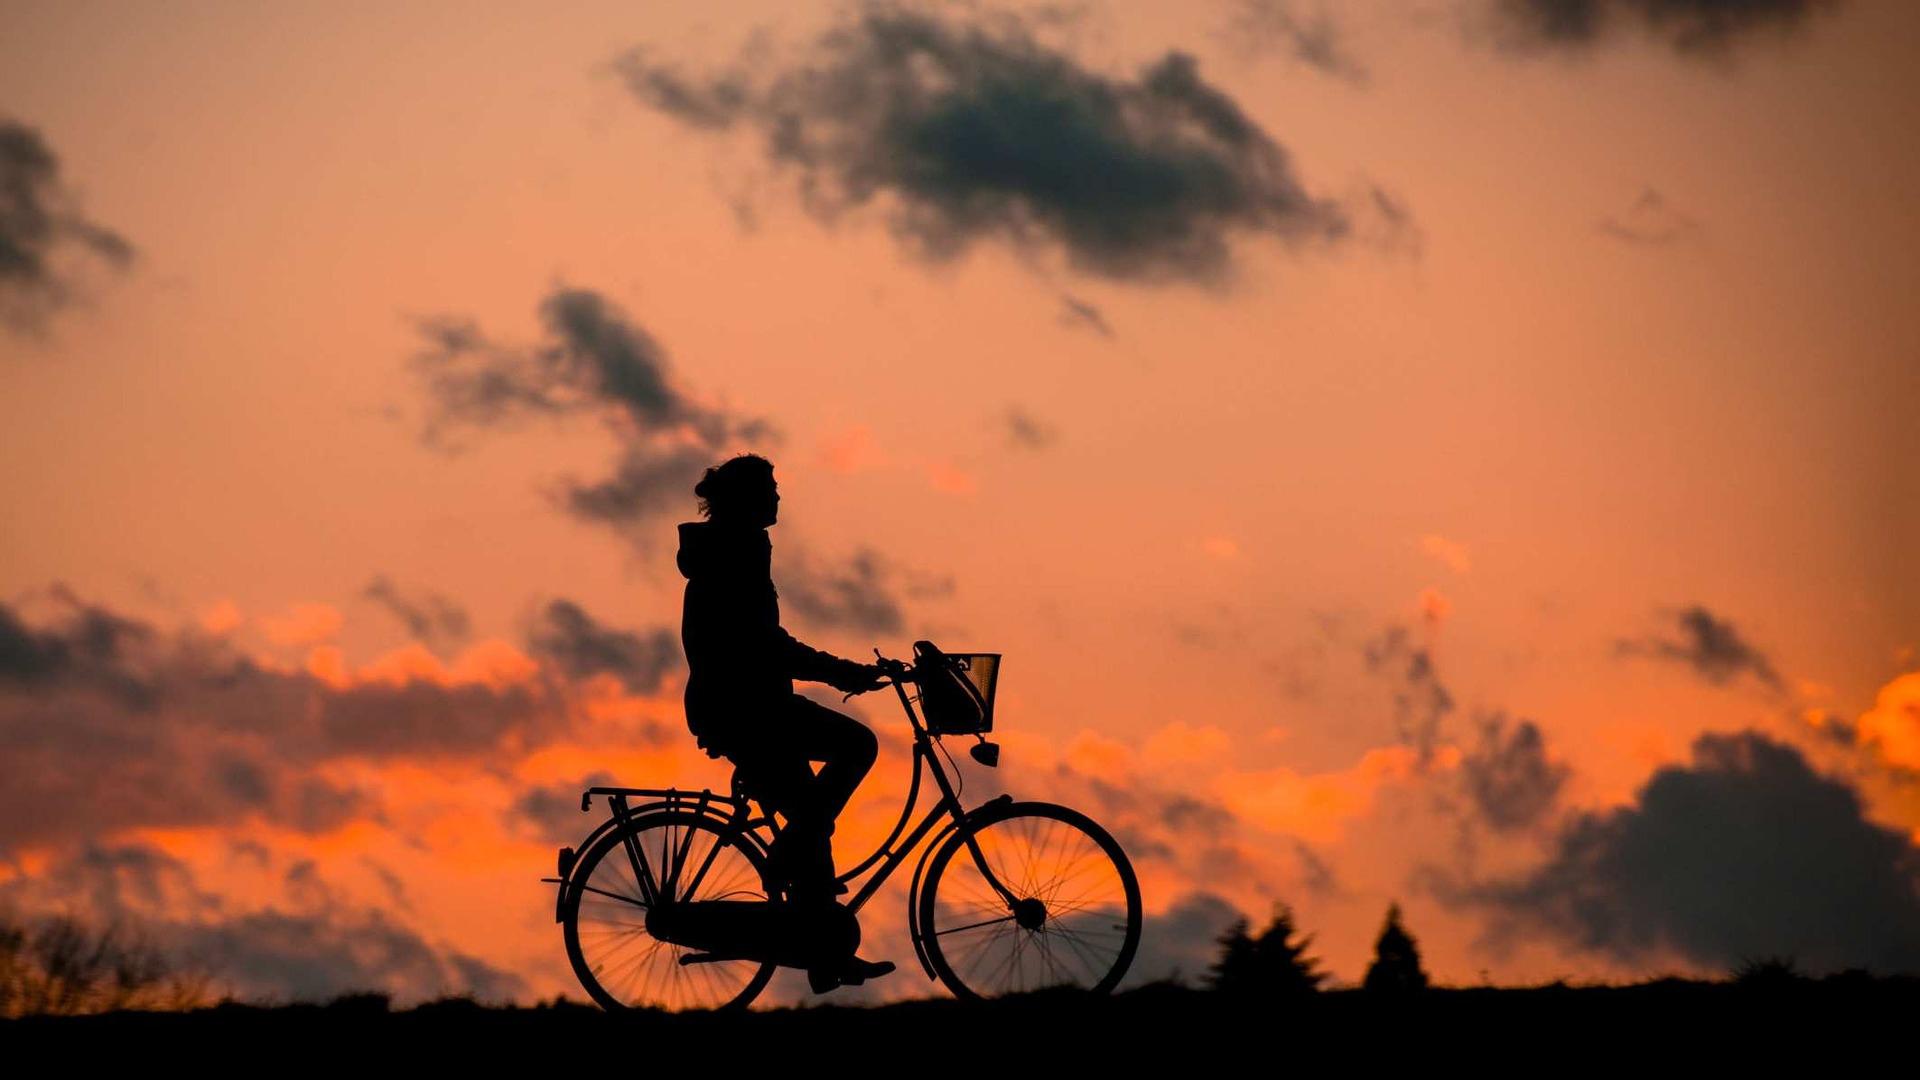 bike silhouette image